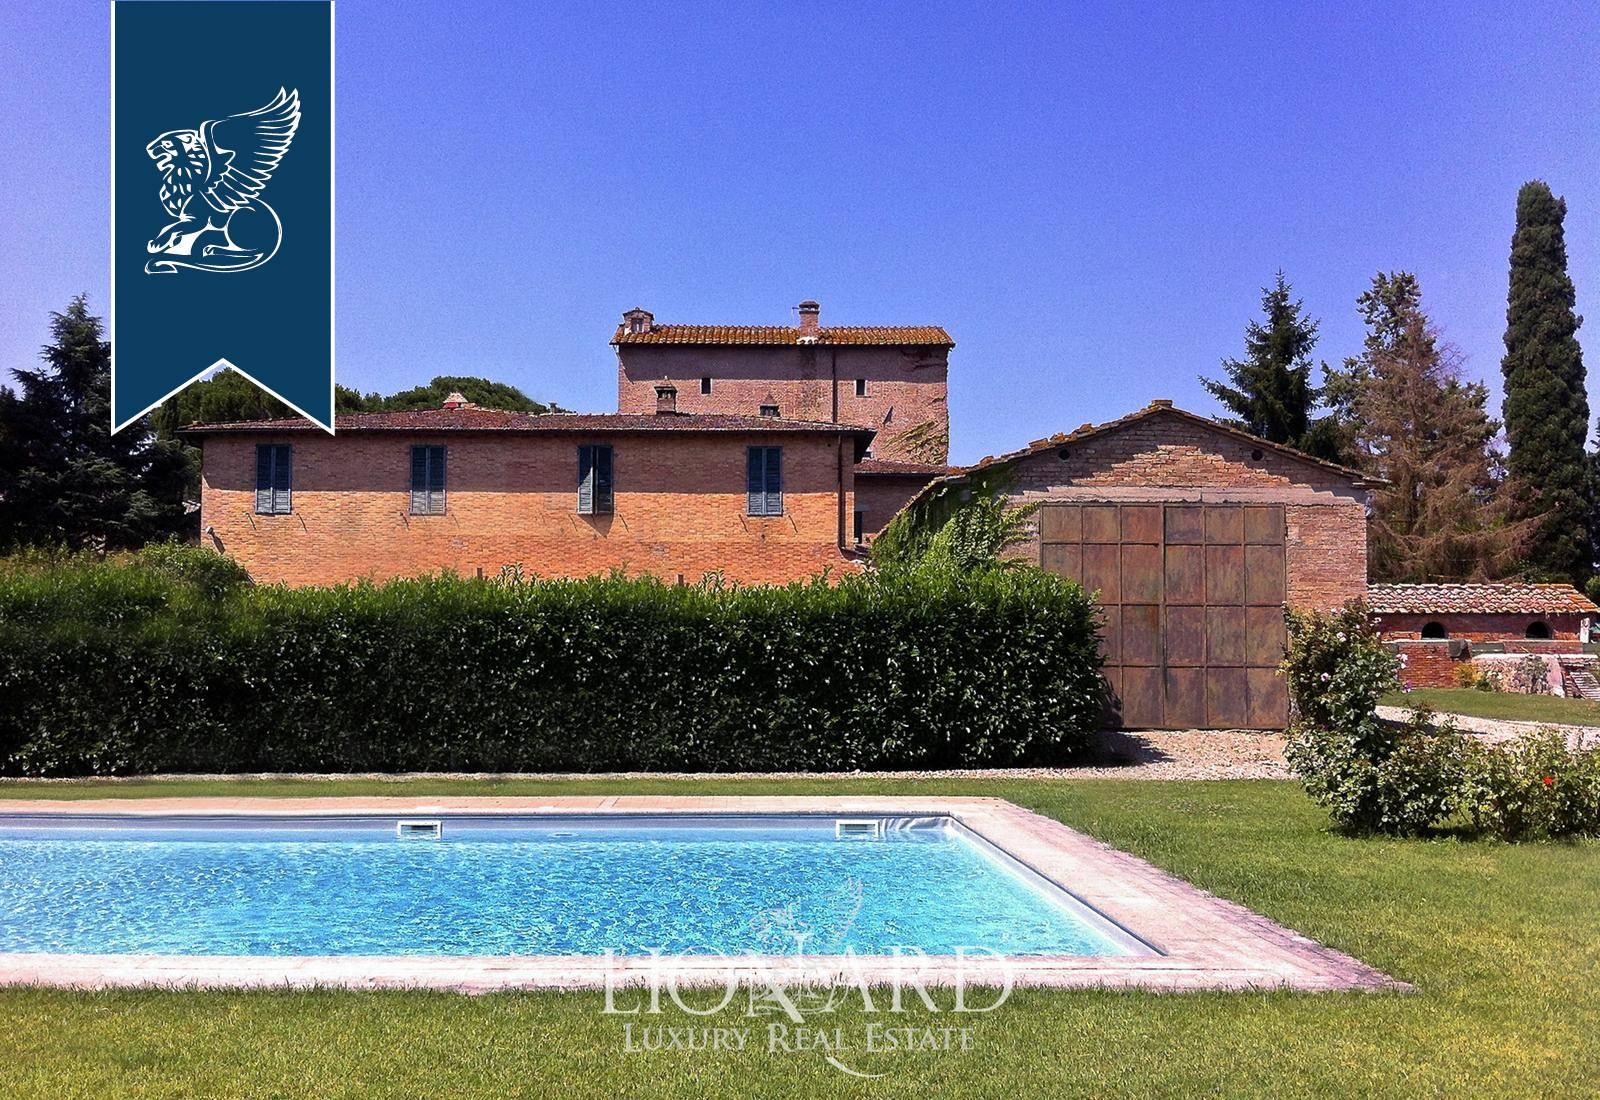 Rustico in Vendita a Siena: 0 locali, 1750 mq - Foto 8